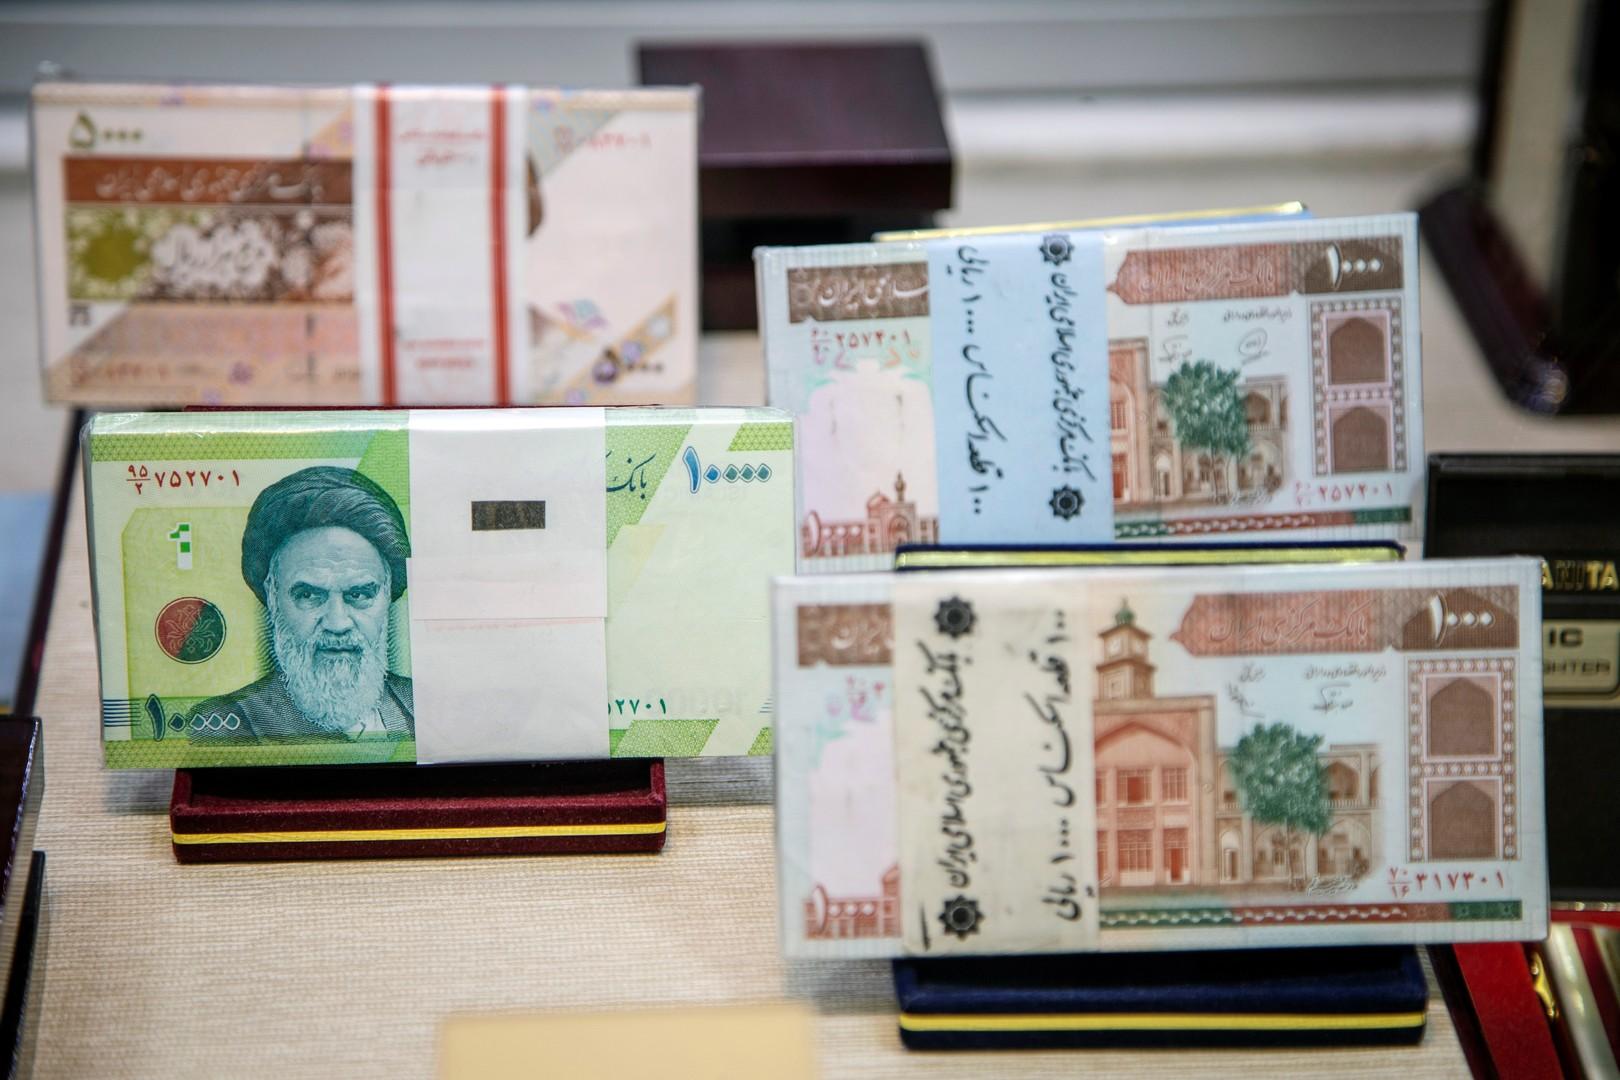 إيران تحذف 4 أصفار من عملتها